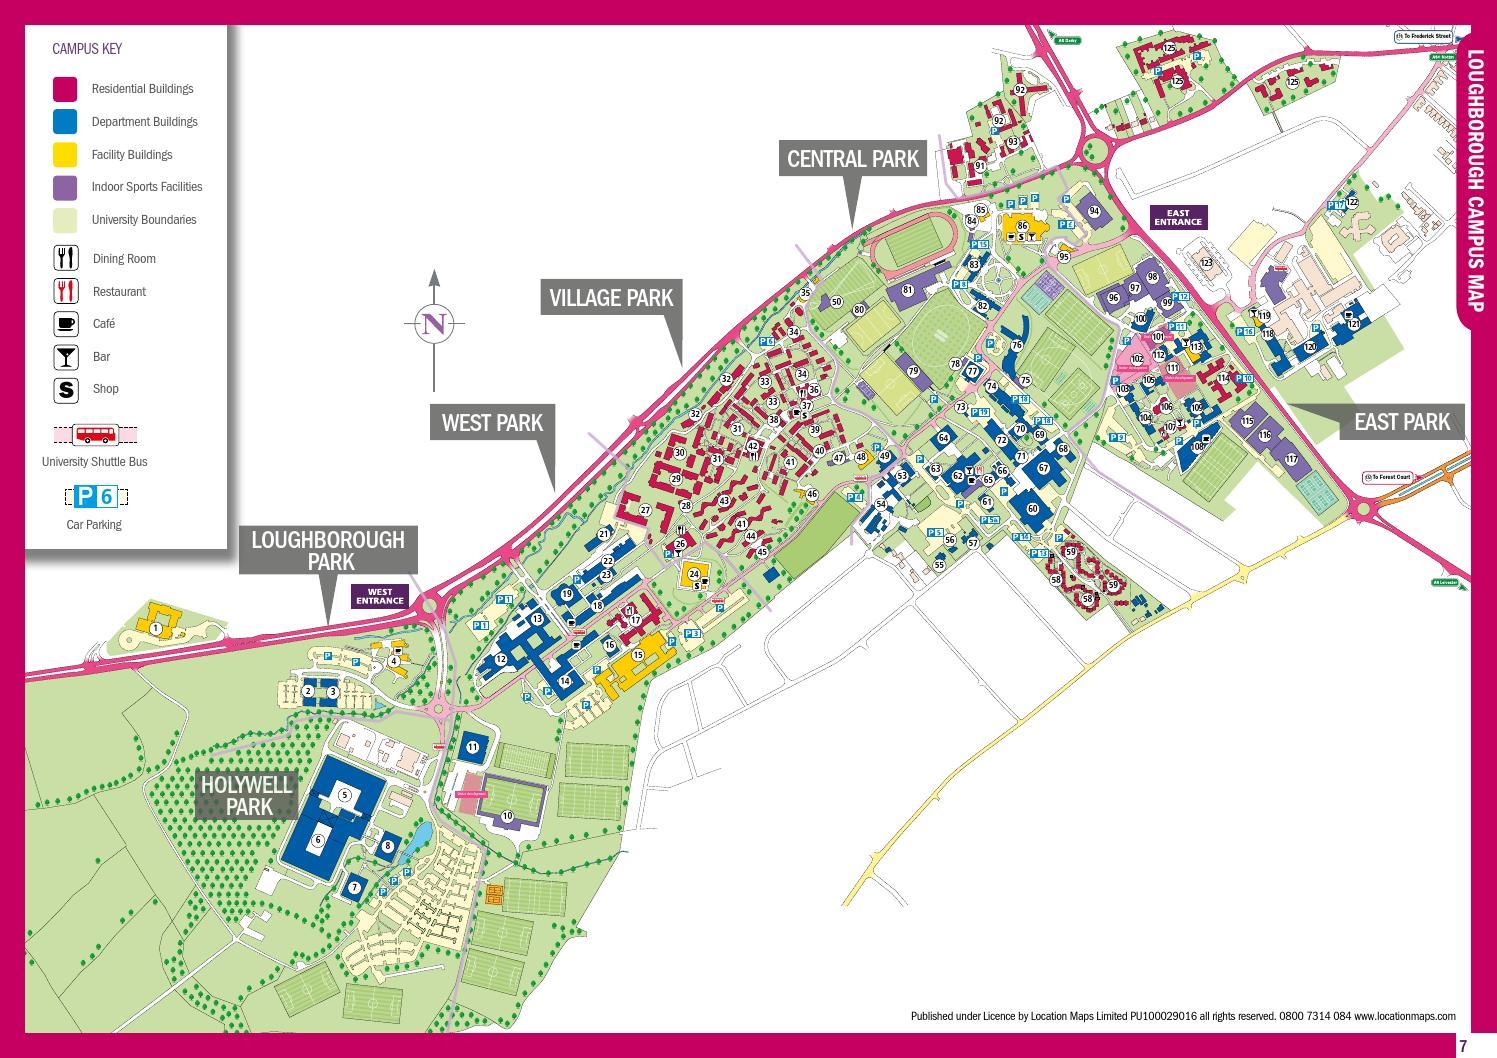 Loughborough University Map Campus Map 2012 by Loughborough University   issuu